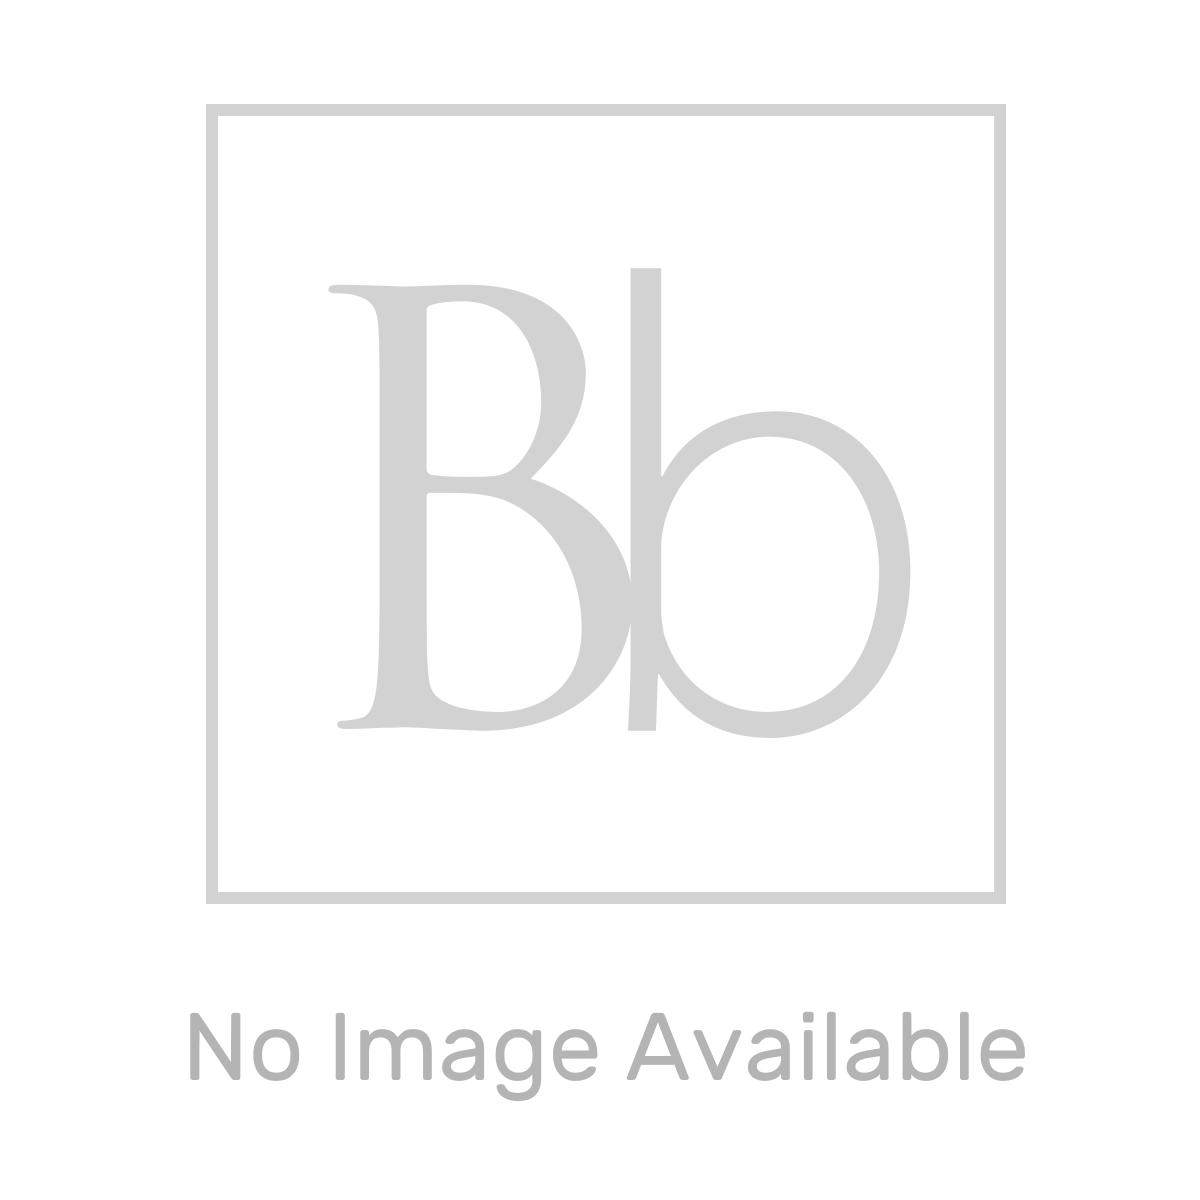 RAK Metropolitan Rimless Back To Wall Toilet with Soft Close Seat